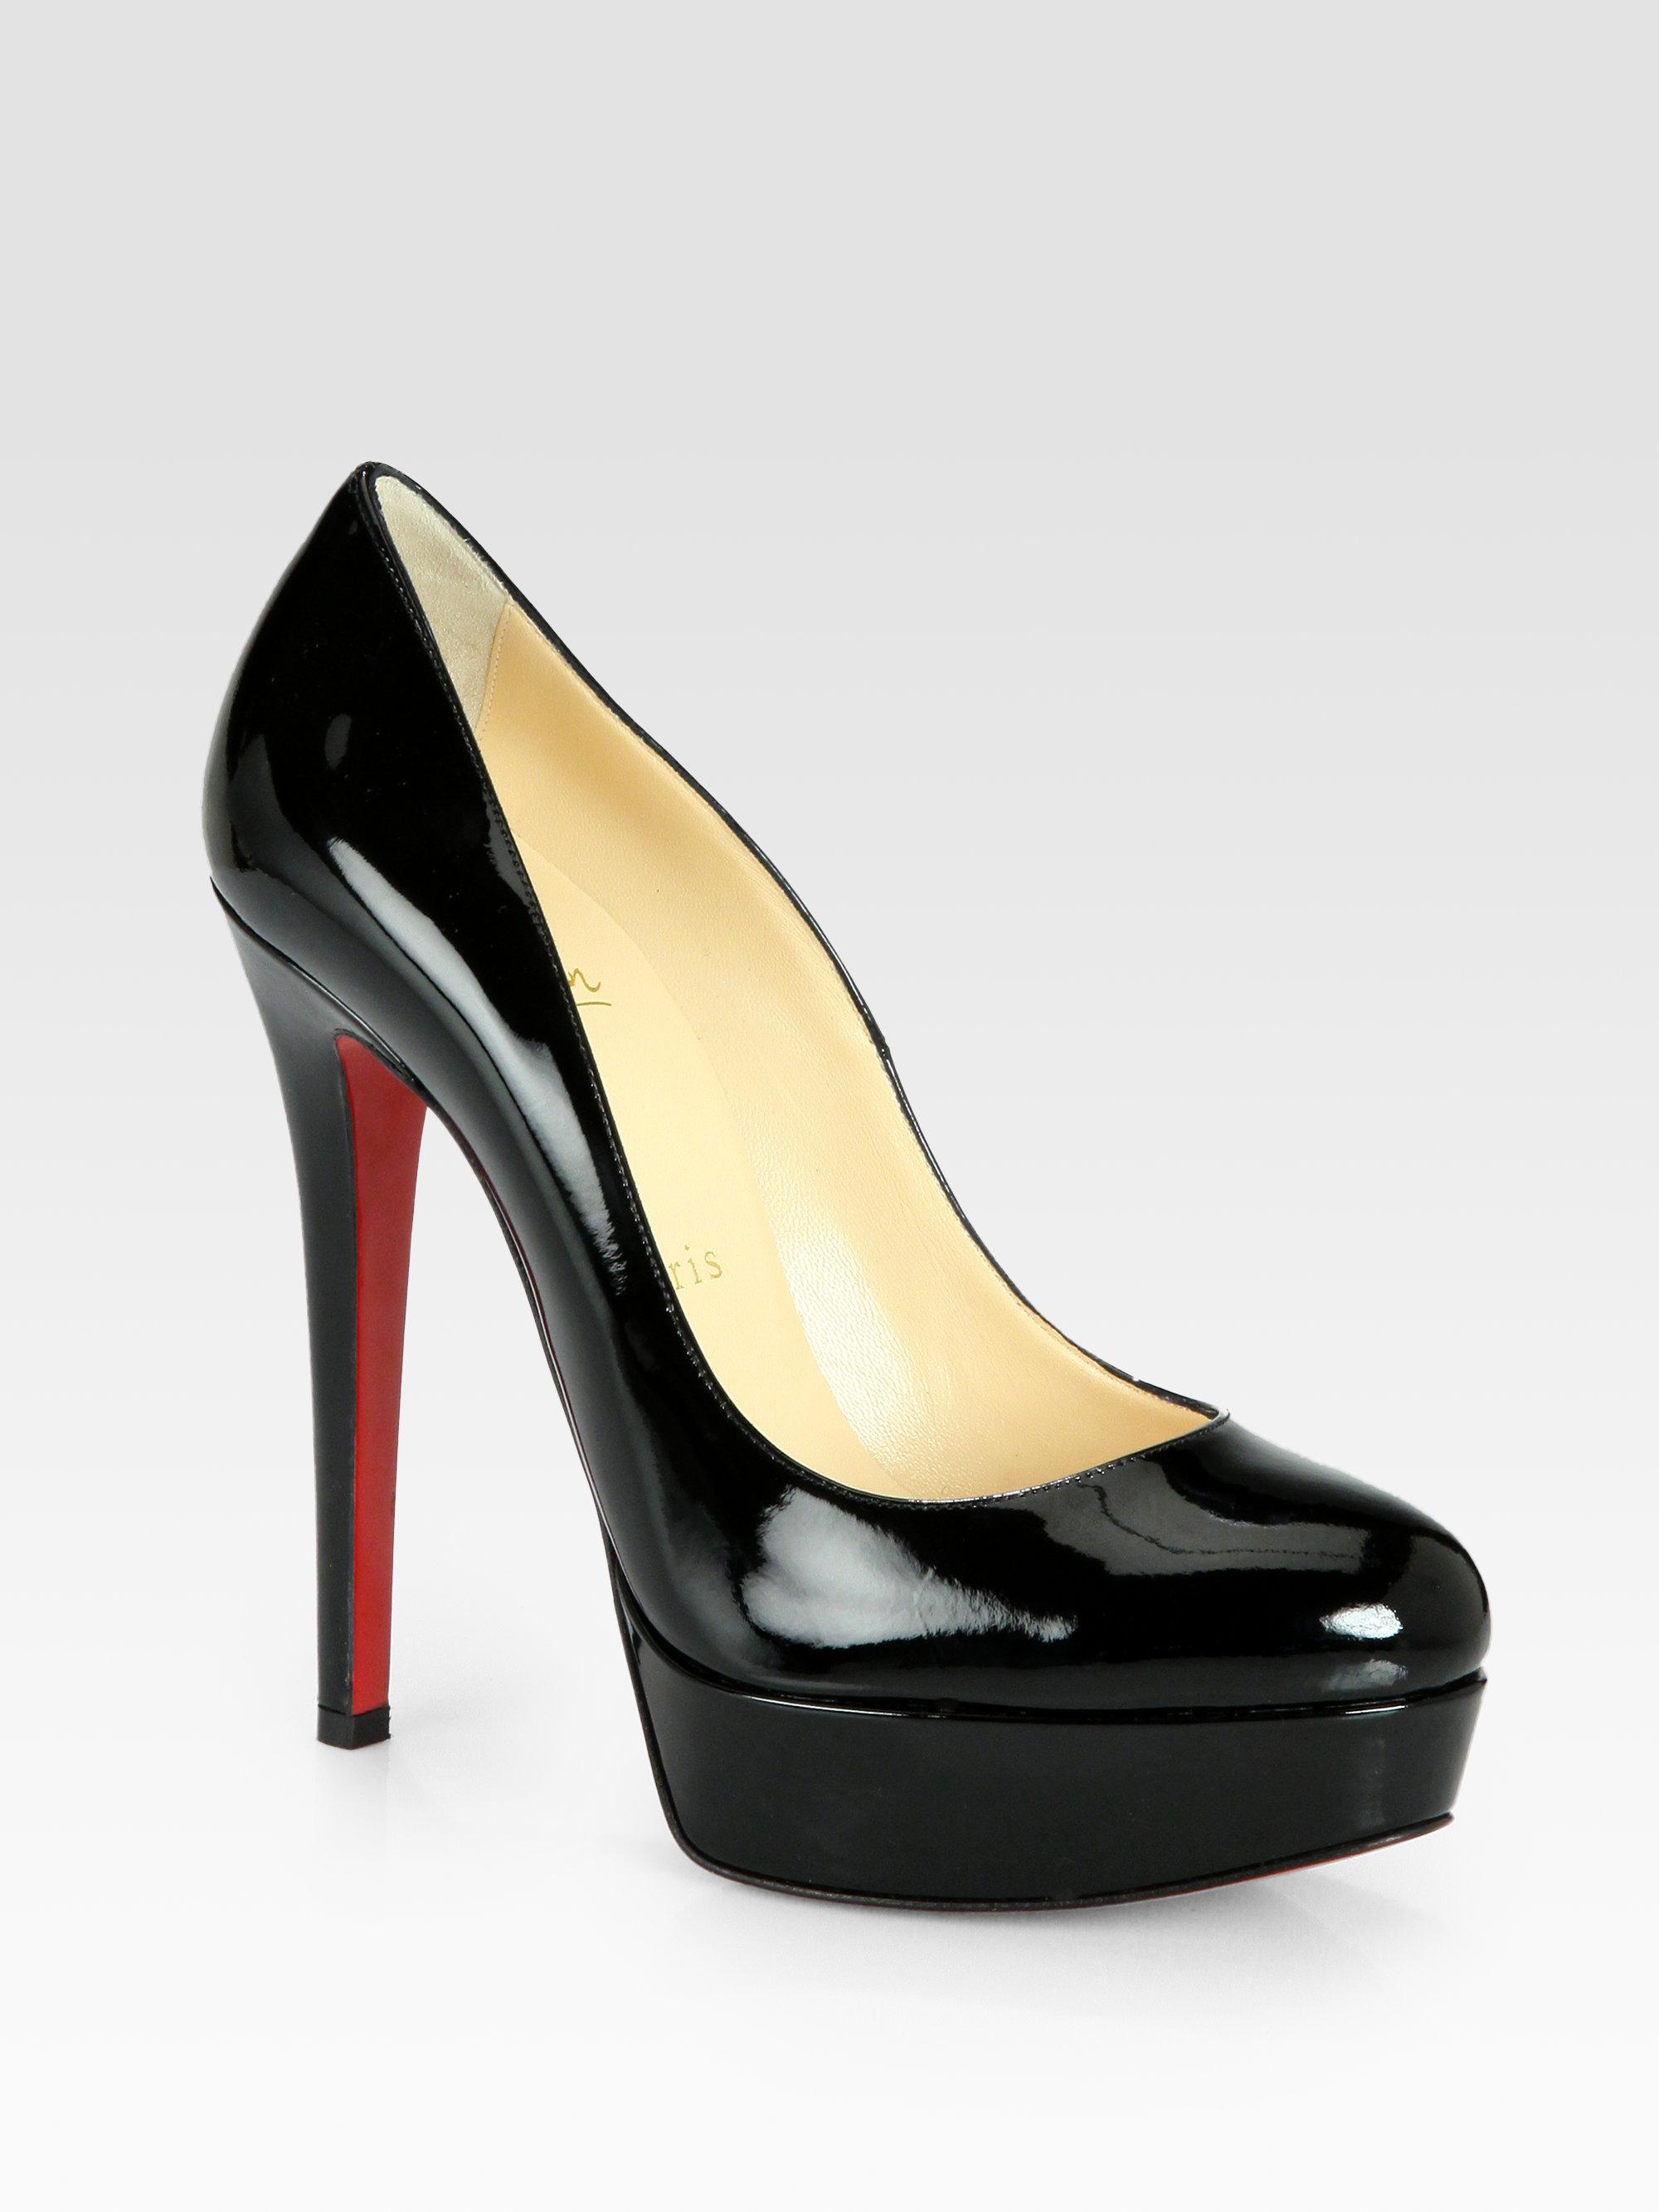 Lyst - Christian Louboutin Bianca Patent Leather Platform Pumps in Black 29dfd0177